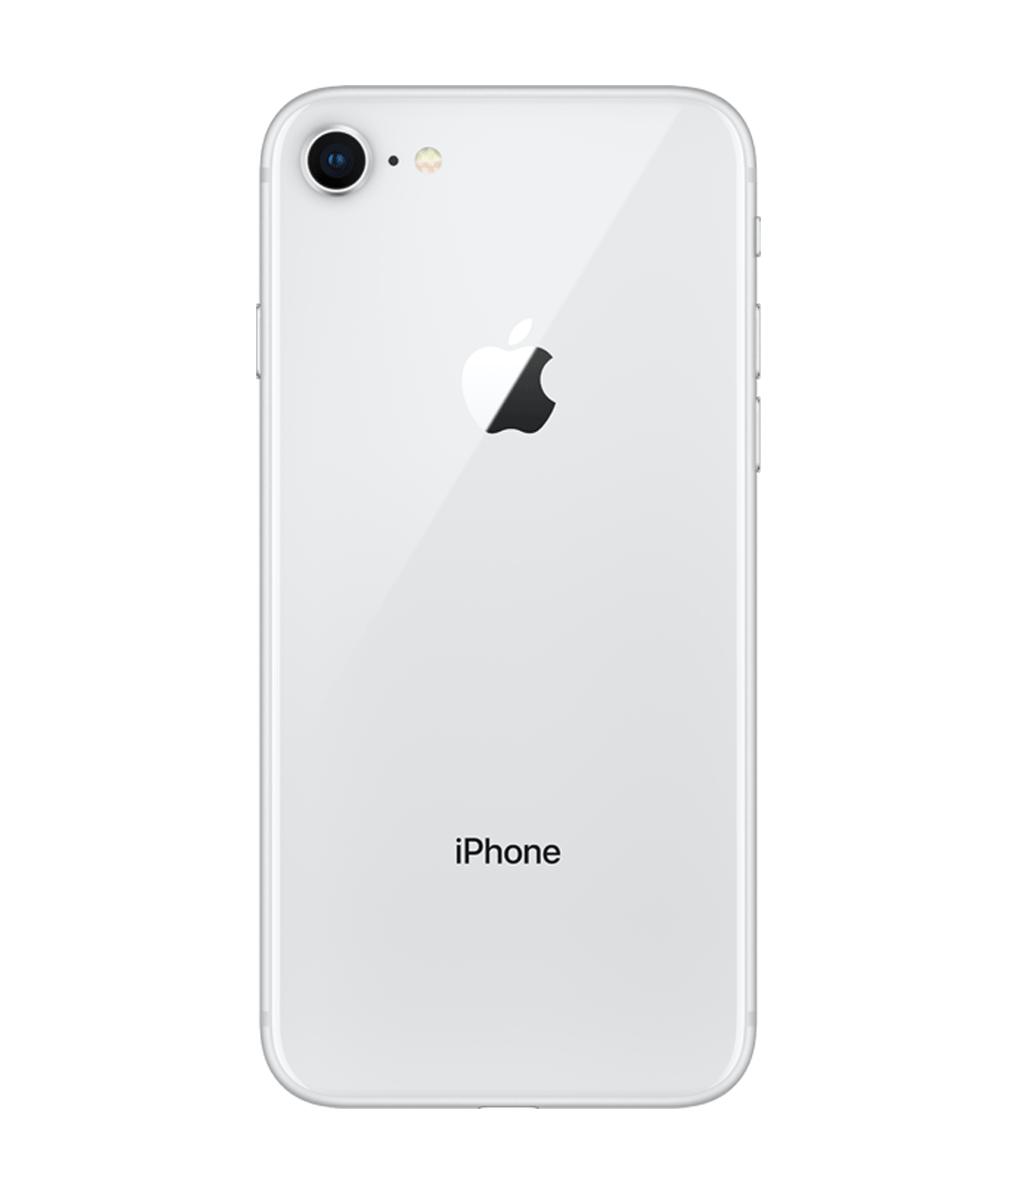 iPhone 8 — GL Mobile Communications